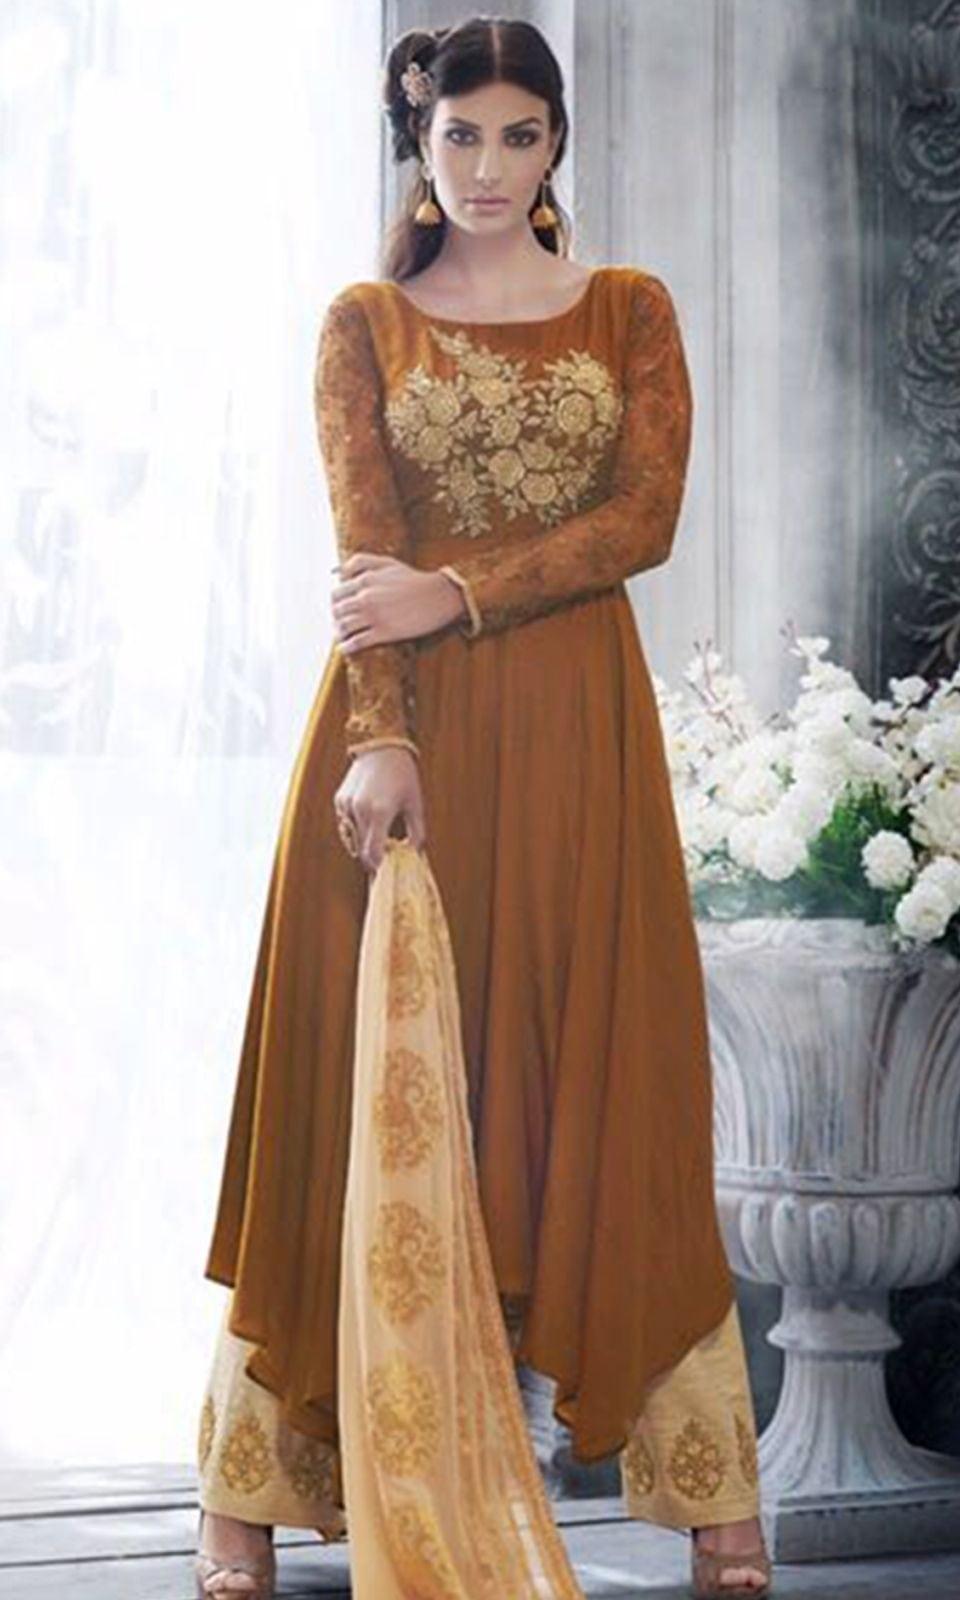 Brown Heavy Embroidered Salwar Suit  • Heavy Embroidered Salwar Suit • Fabric : Georgette • Salwar Fabric : Khadi Silk • Dupatta Fabric : Chiffon • Size : Semi-Stitched (customizable Upto size-44)  SKU: SUEBRNK3061 Rs. 5,299.00  at Best Price online at #IshiMaya #weddingday #weddingdress #weddings #happynewyears #happynewyear2018 #christmasparty #x-mas